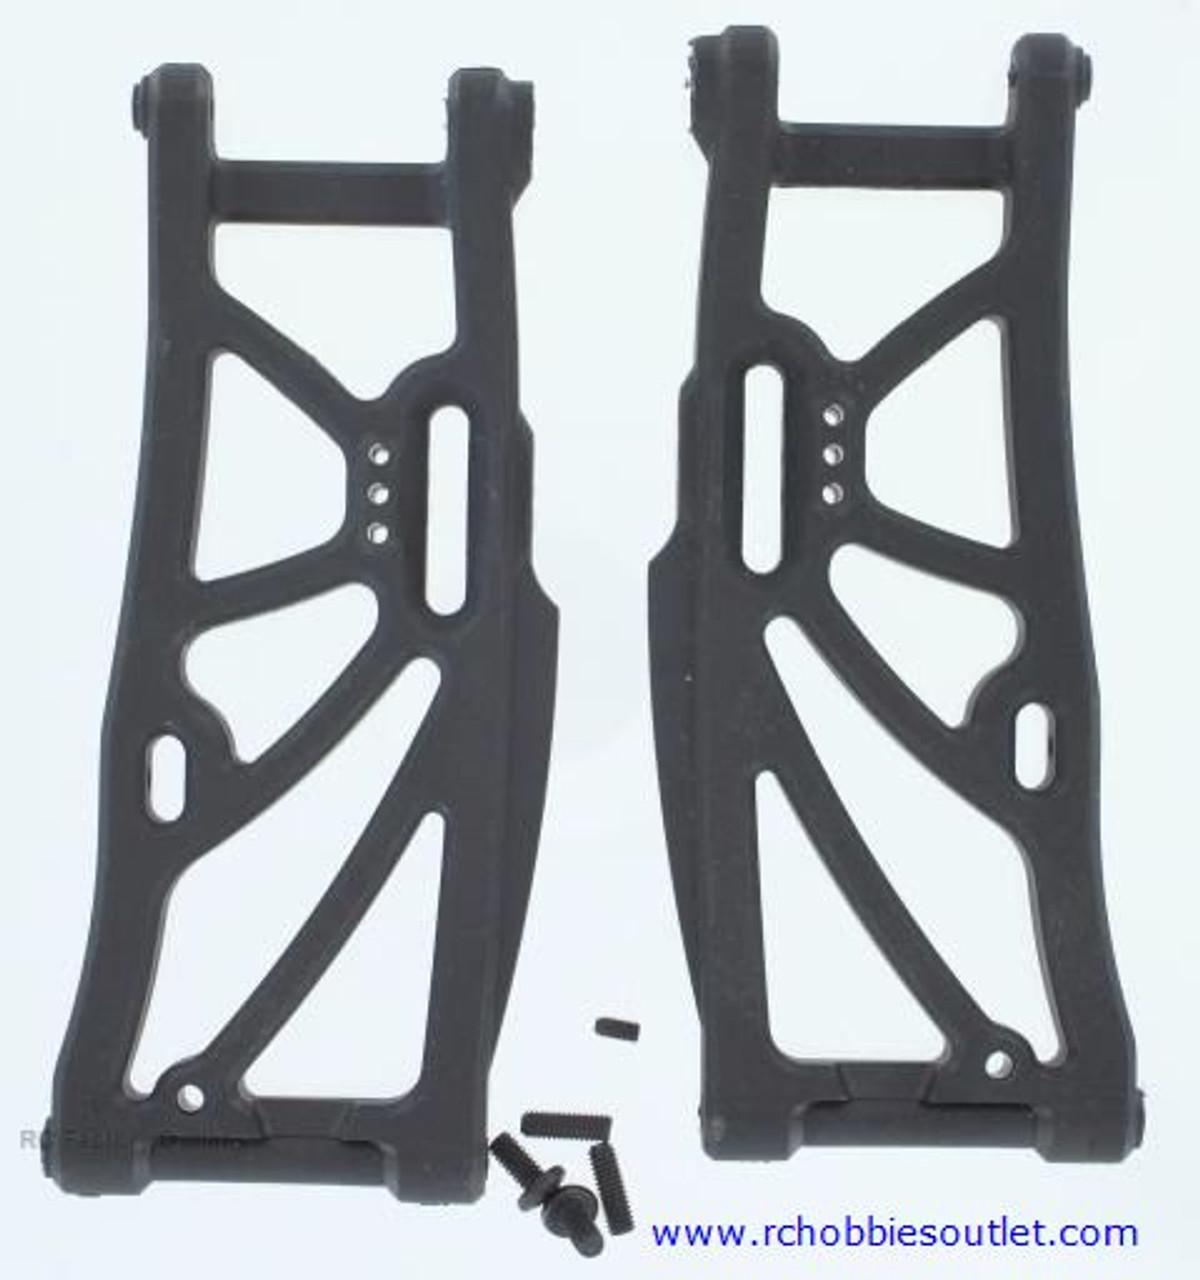 88305 1/8 Rear Lower Suspension Arm